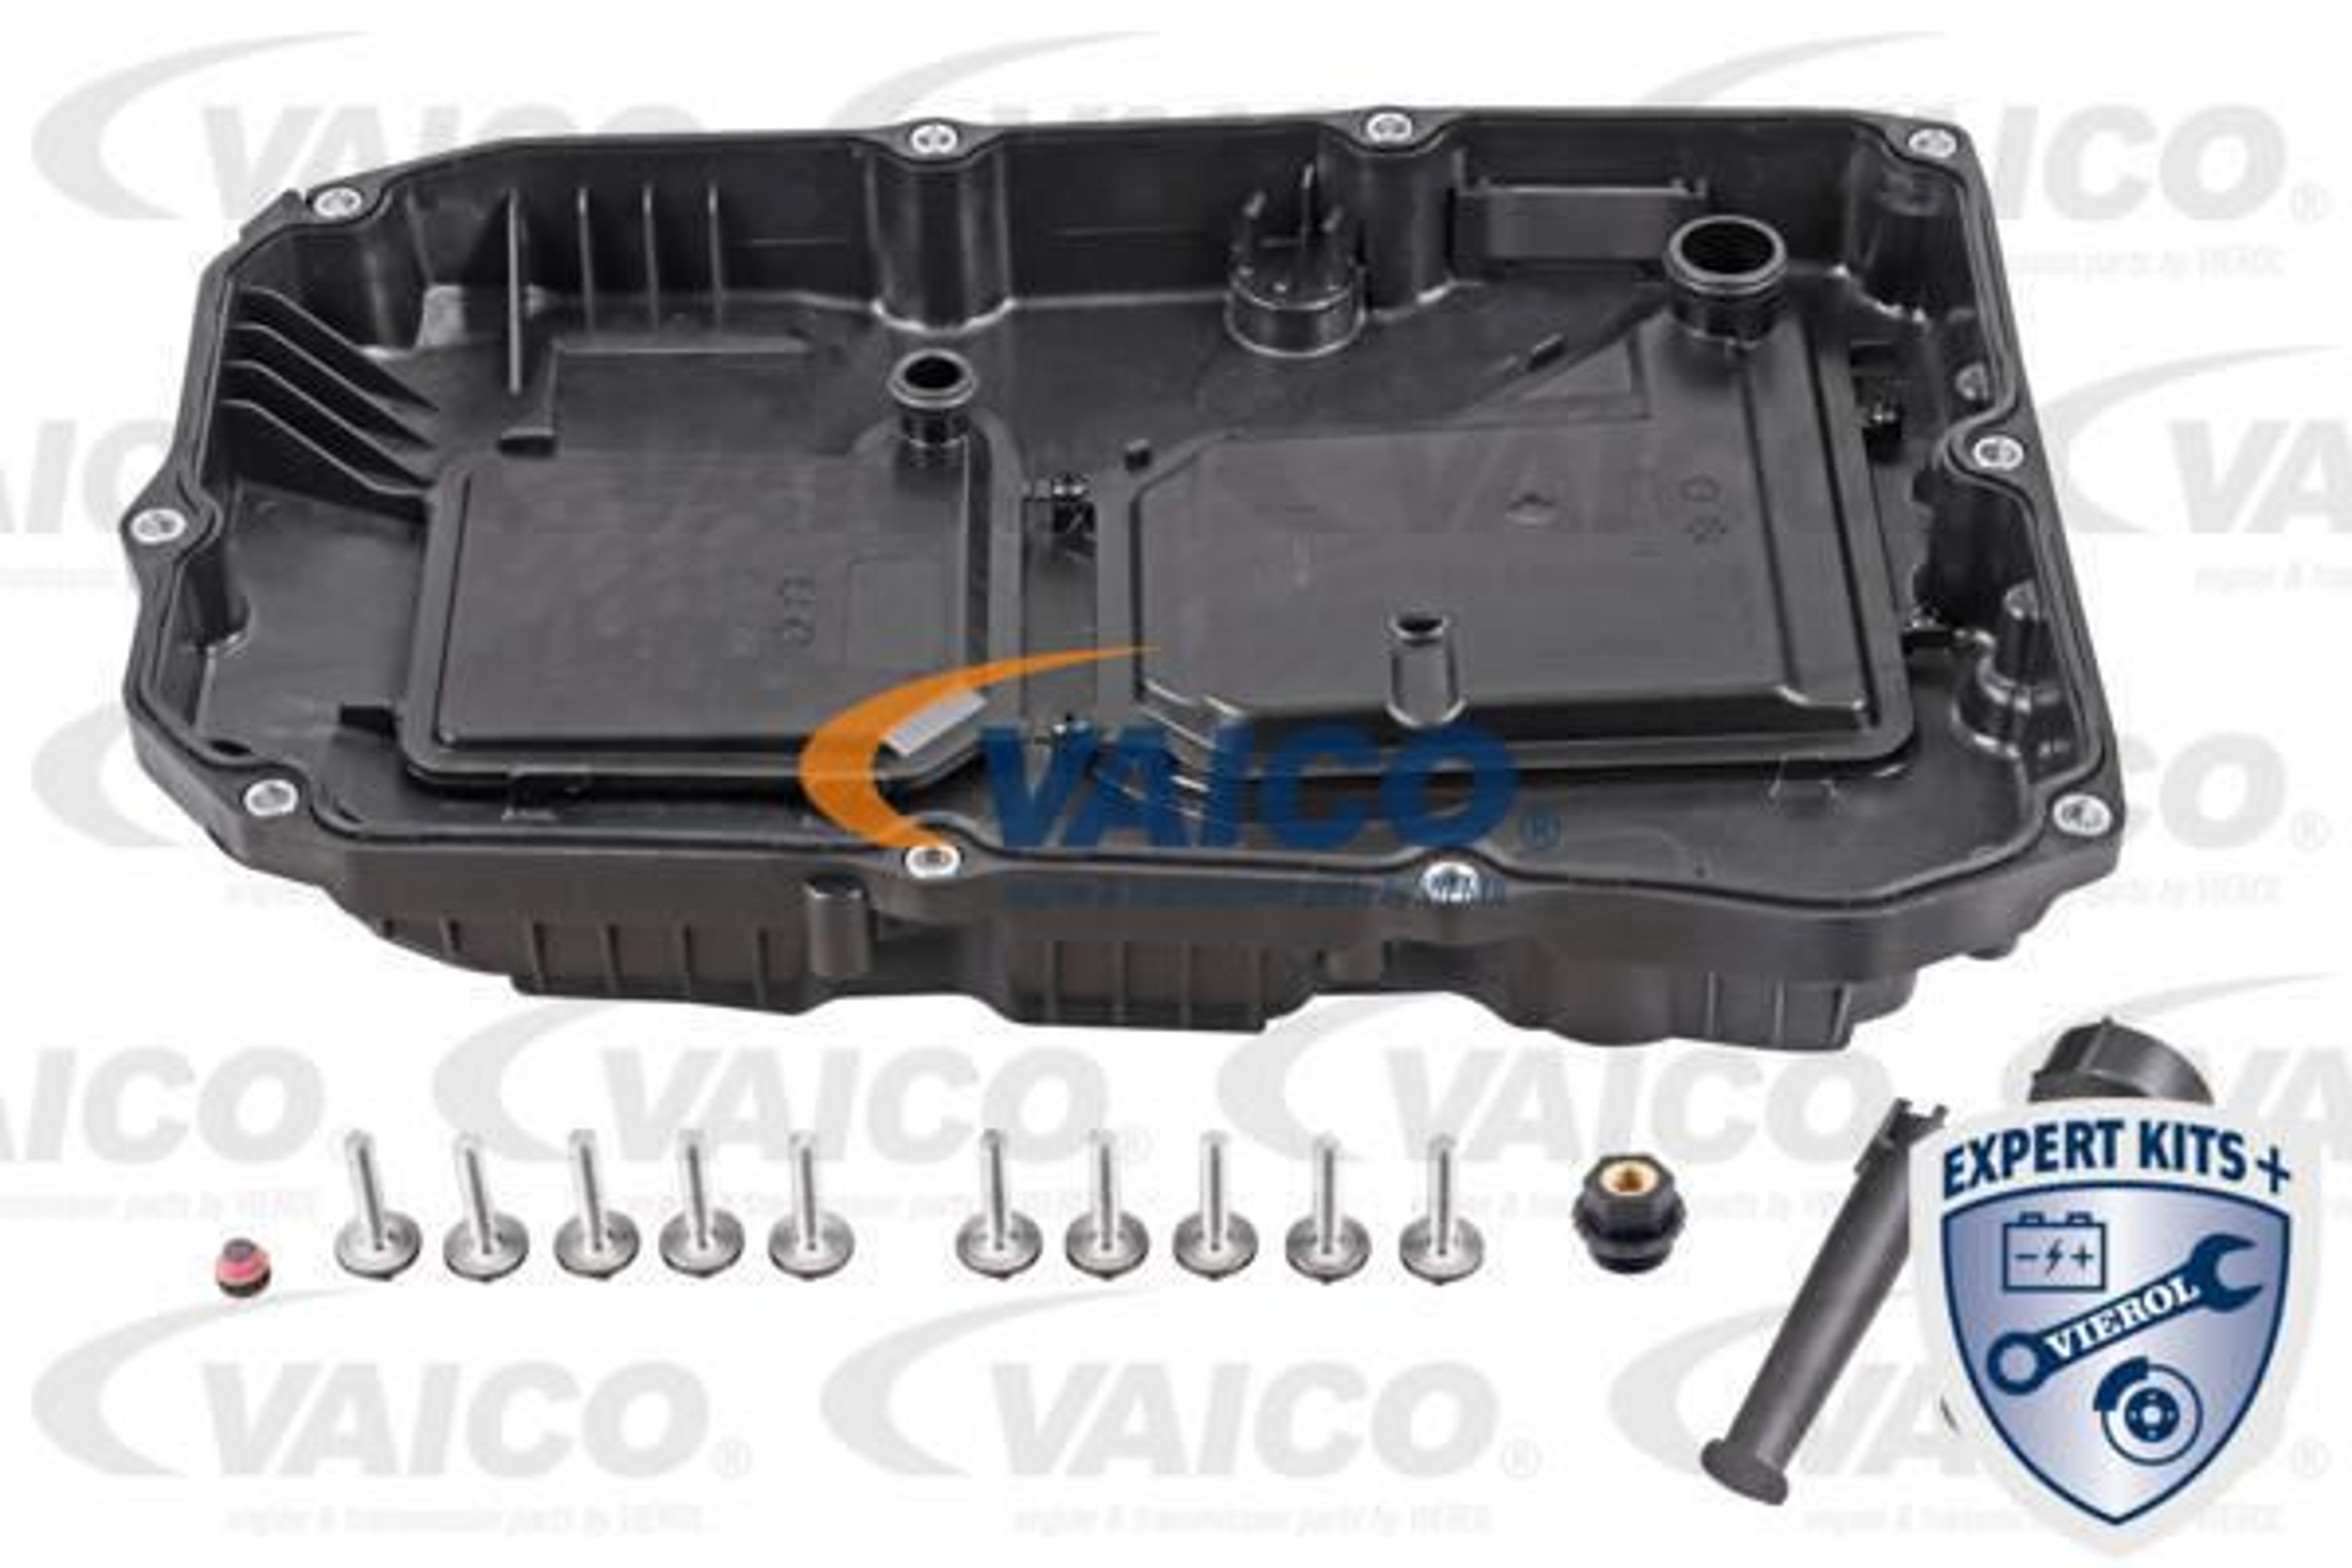 MERCEDES-BENZ C-Klasse 2015 Teilesatz, Ölwechsel-Automatikgetriebe - Original VAICO V30-2377-BEK